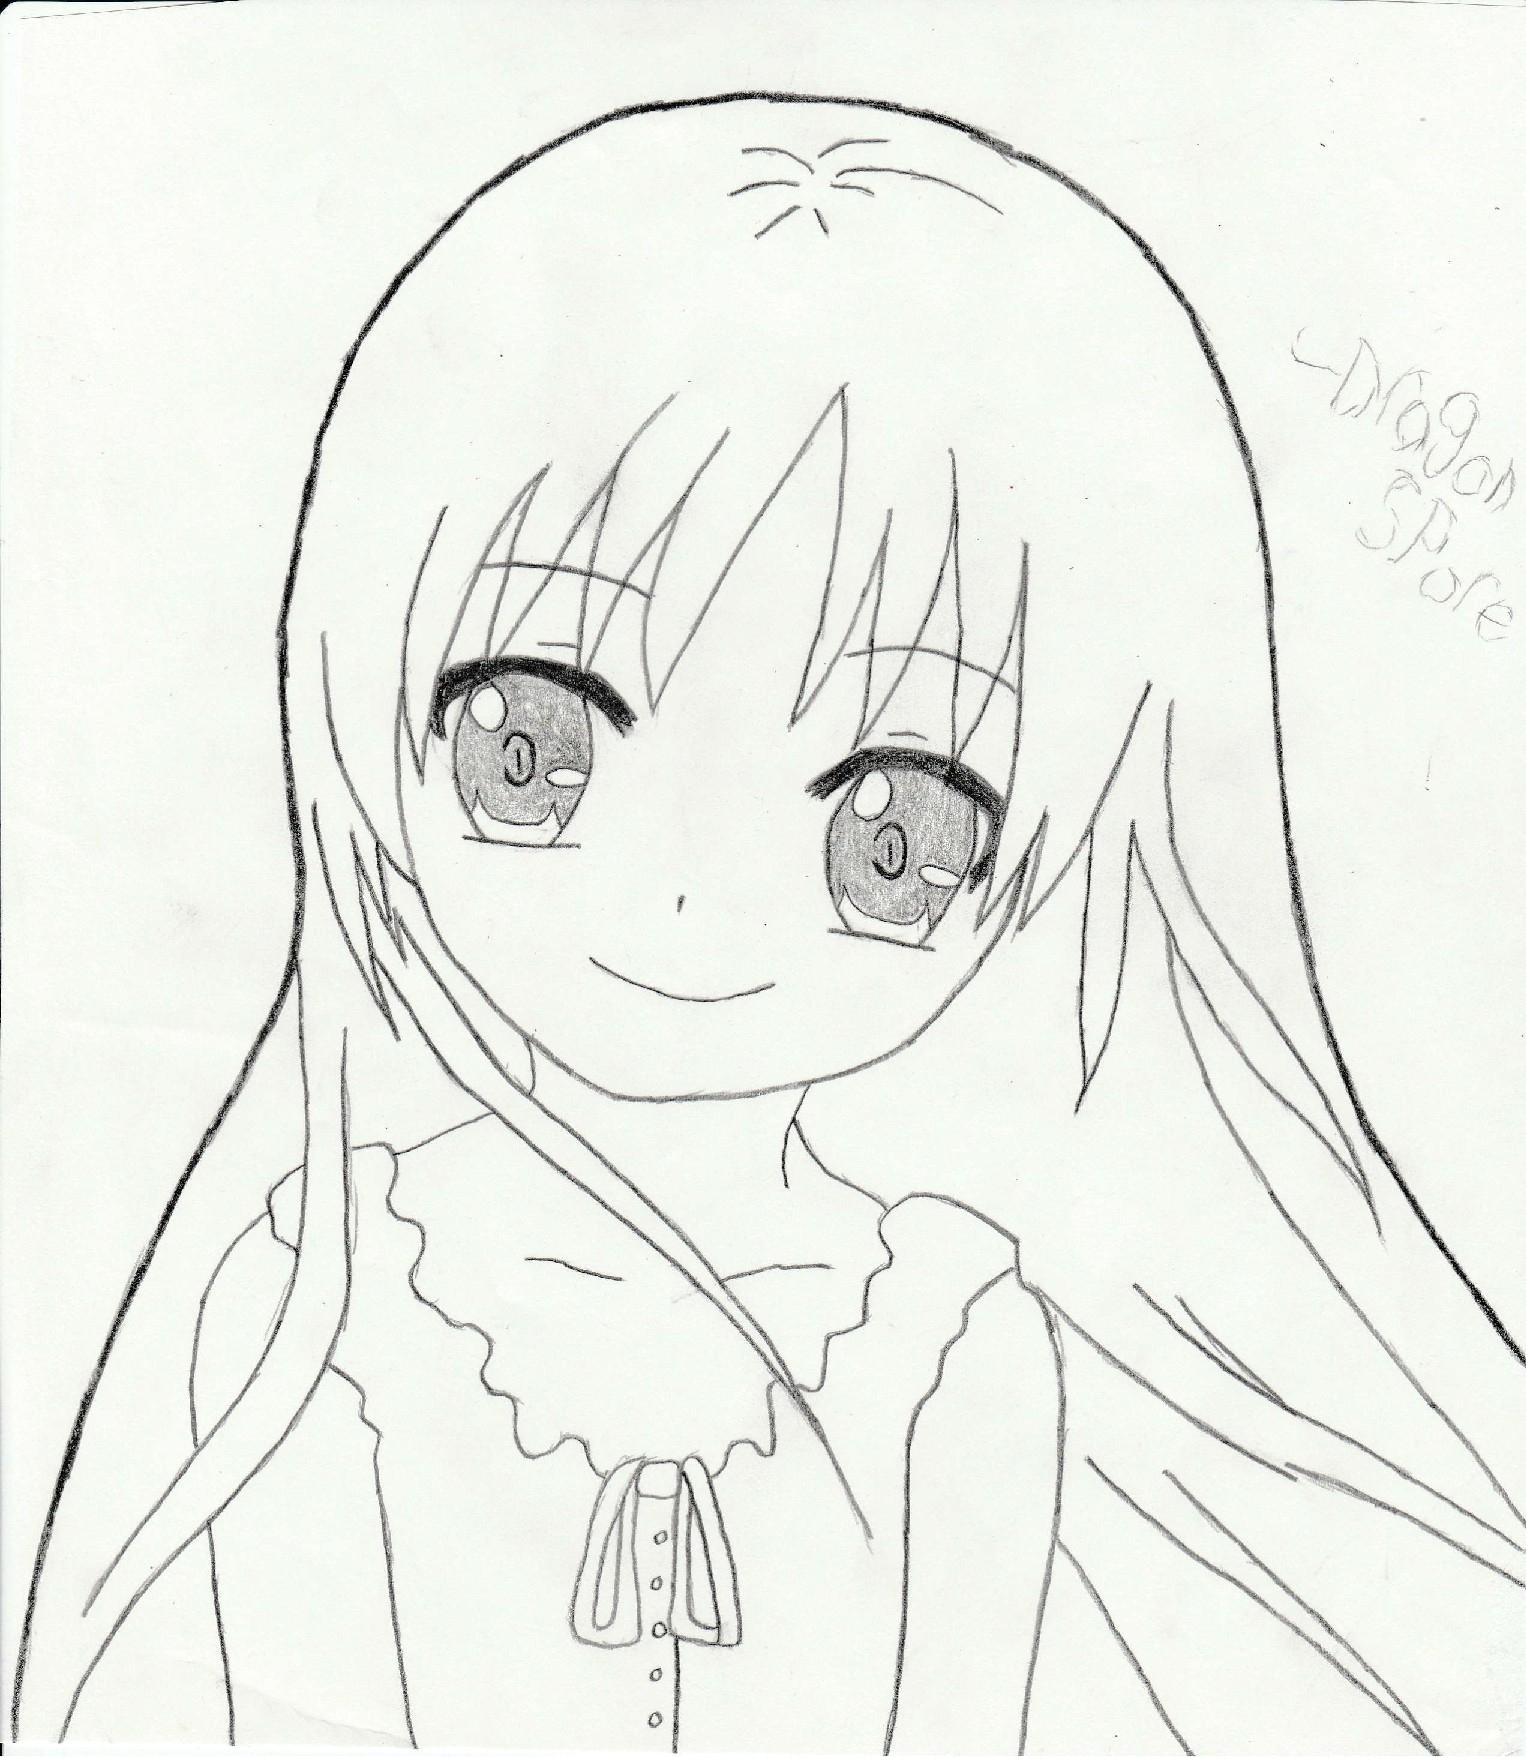 1526x1757 Cute Anime Drawings Cute Anime Girlkiri Akuma On Deviantart